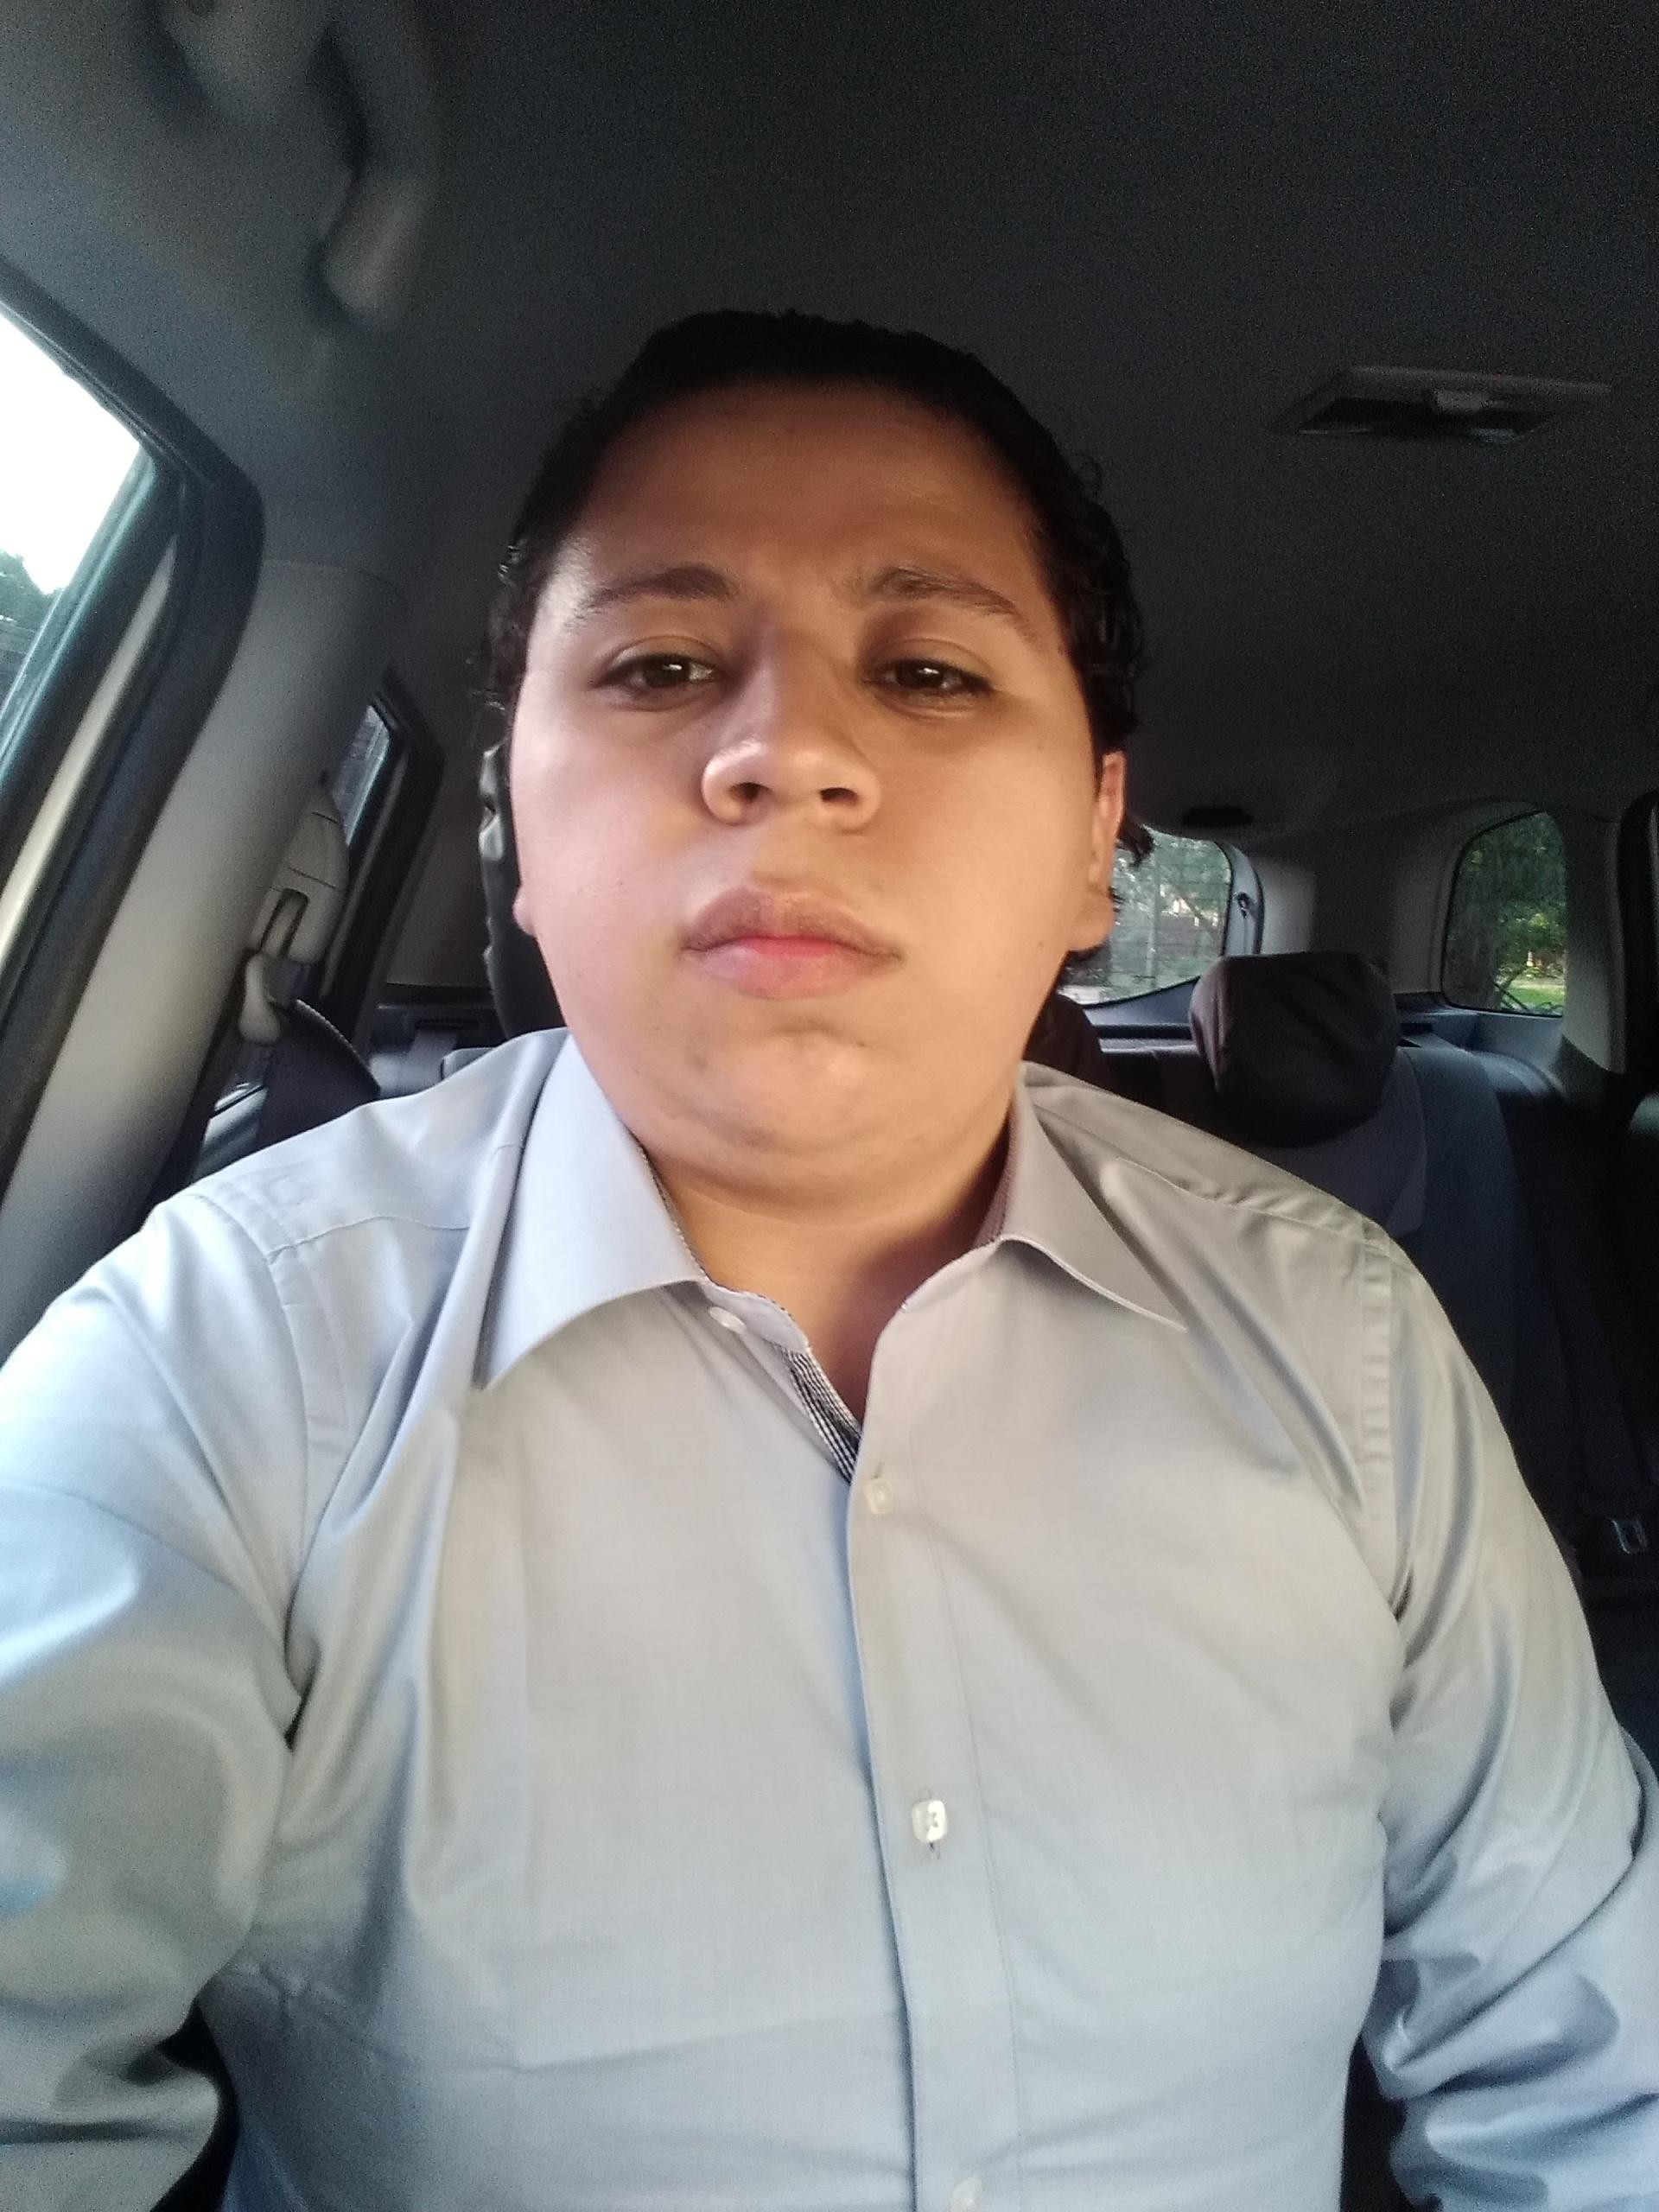 Ismael Rojas Zurita